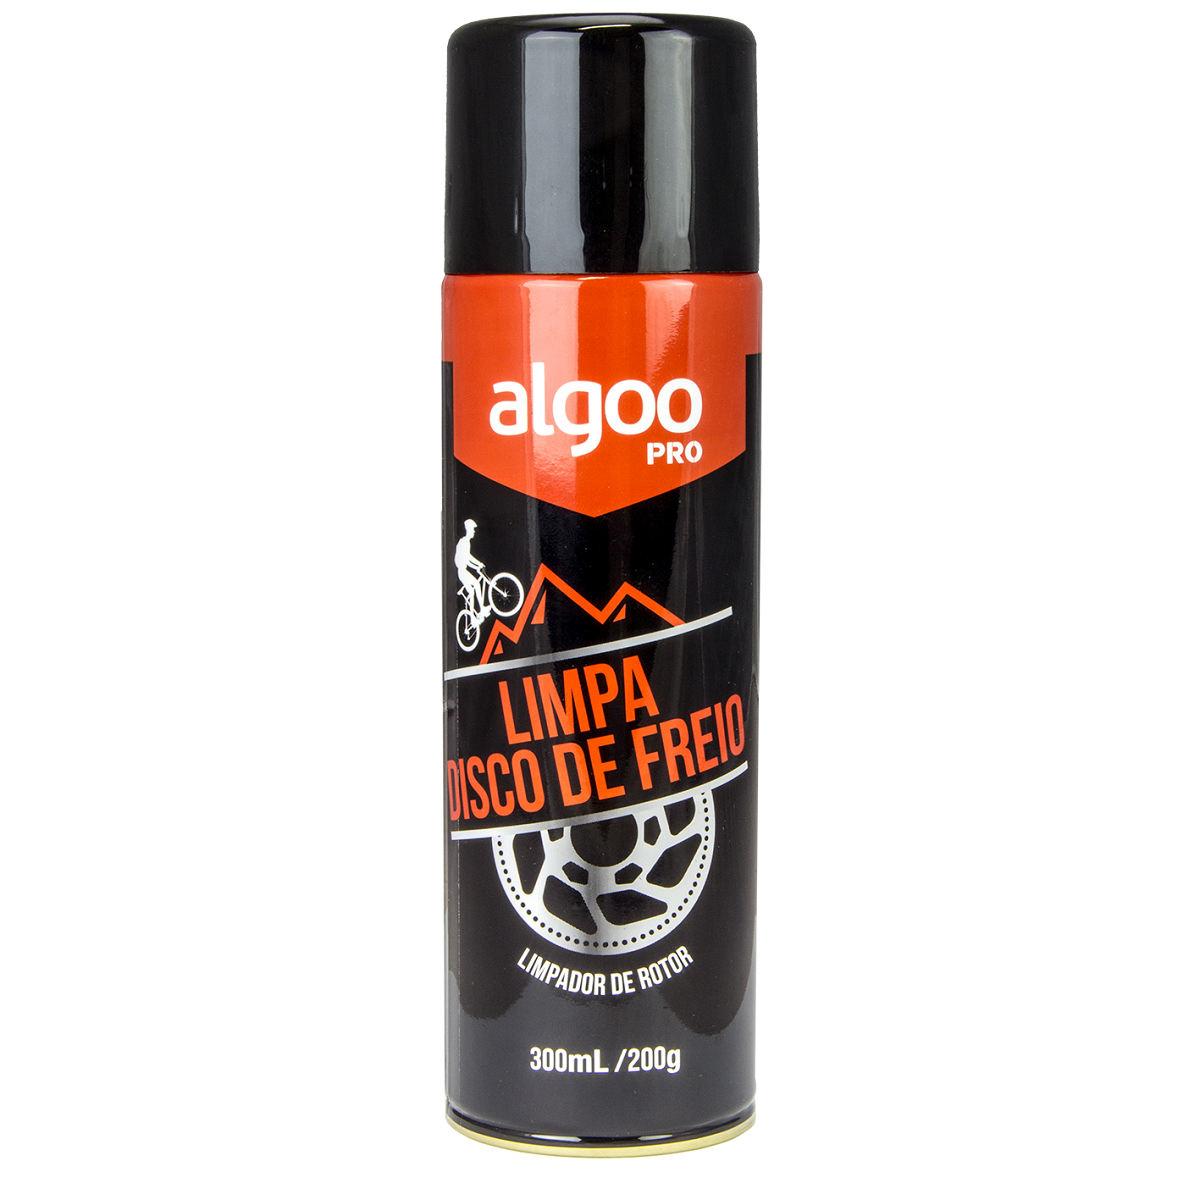 Limpa Disco De Freio, Spray 300Ml